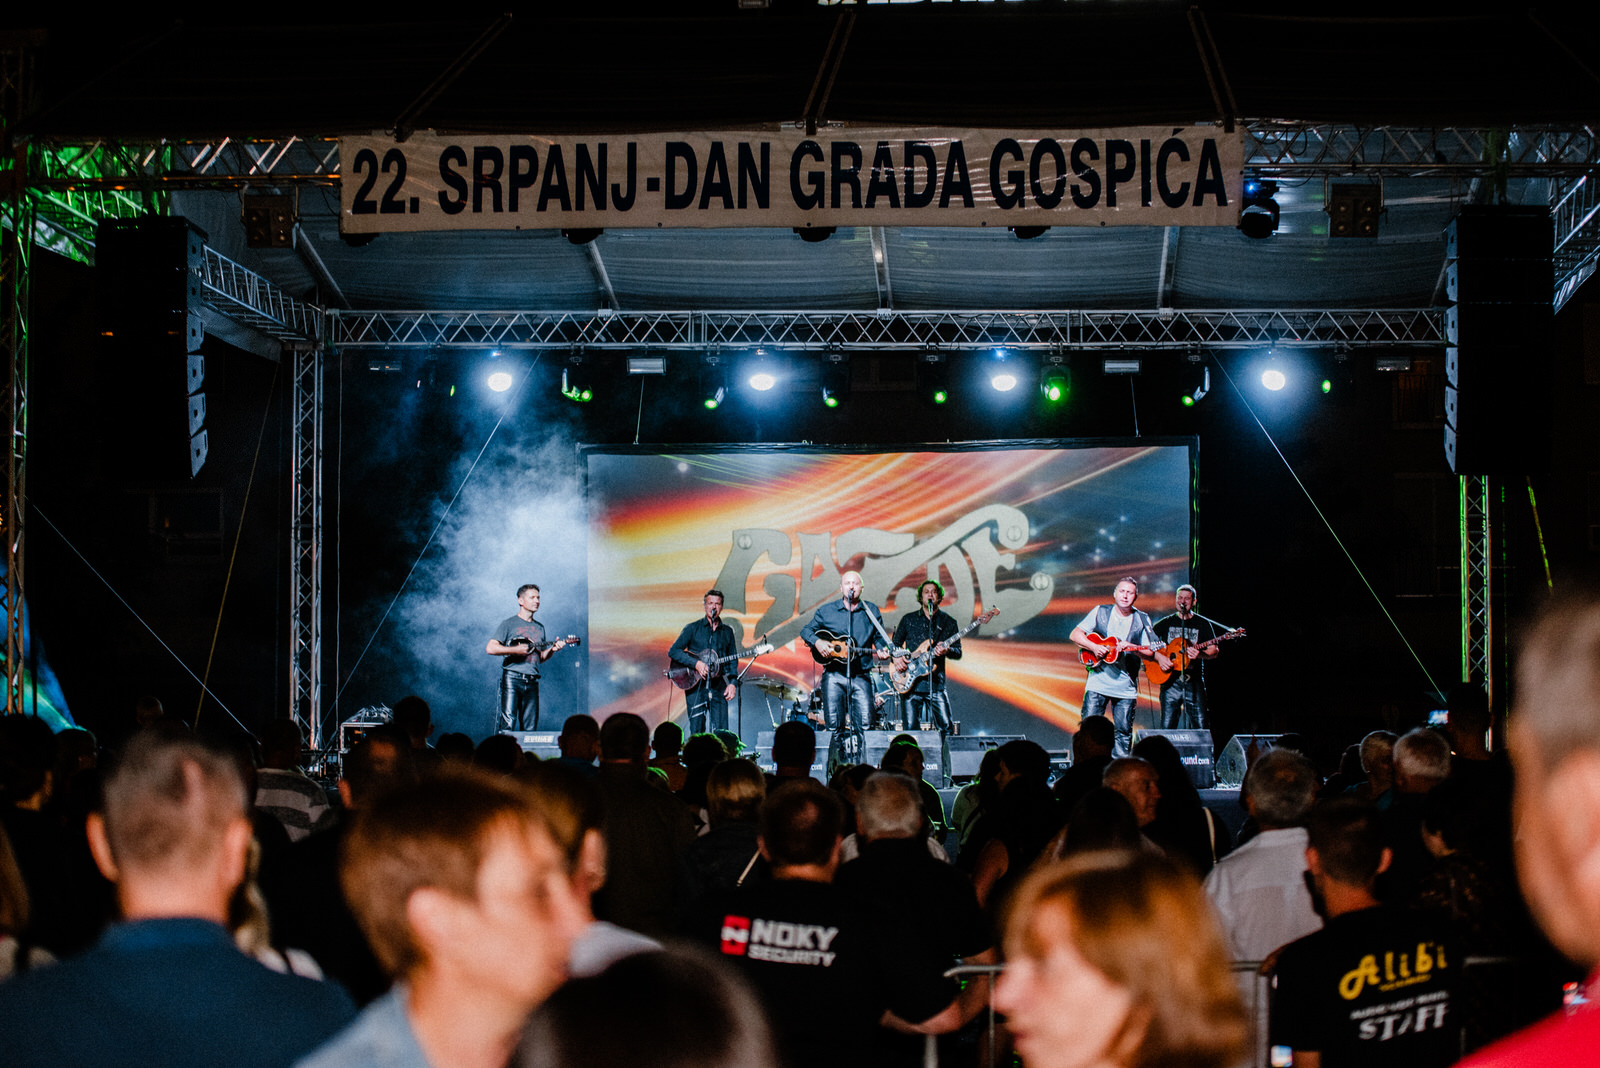 likaclub_dan-Grada-Gospića-2019_1-dan-22